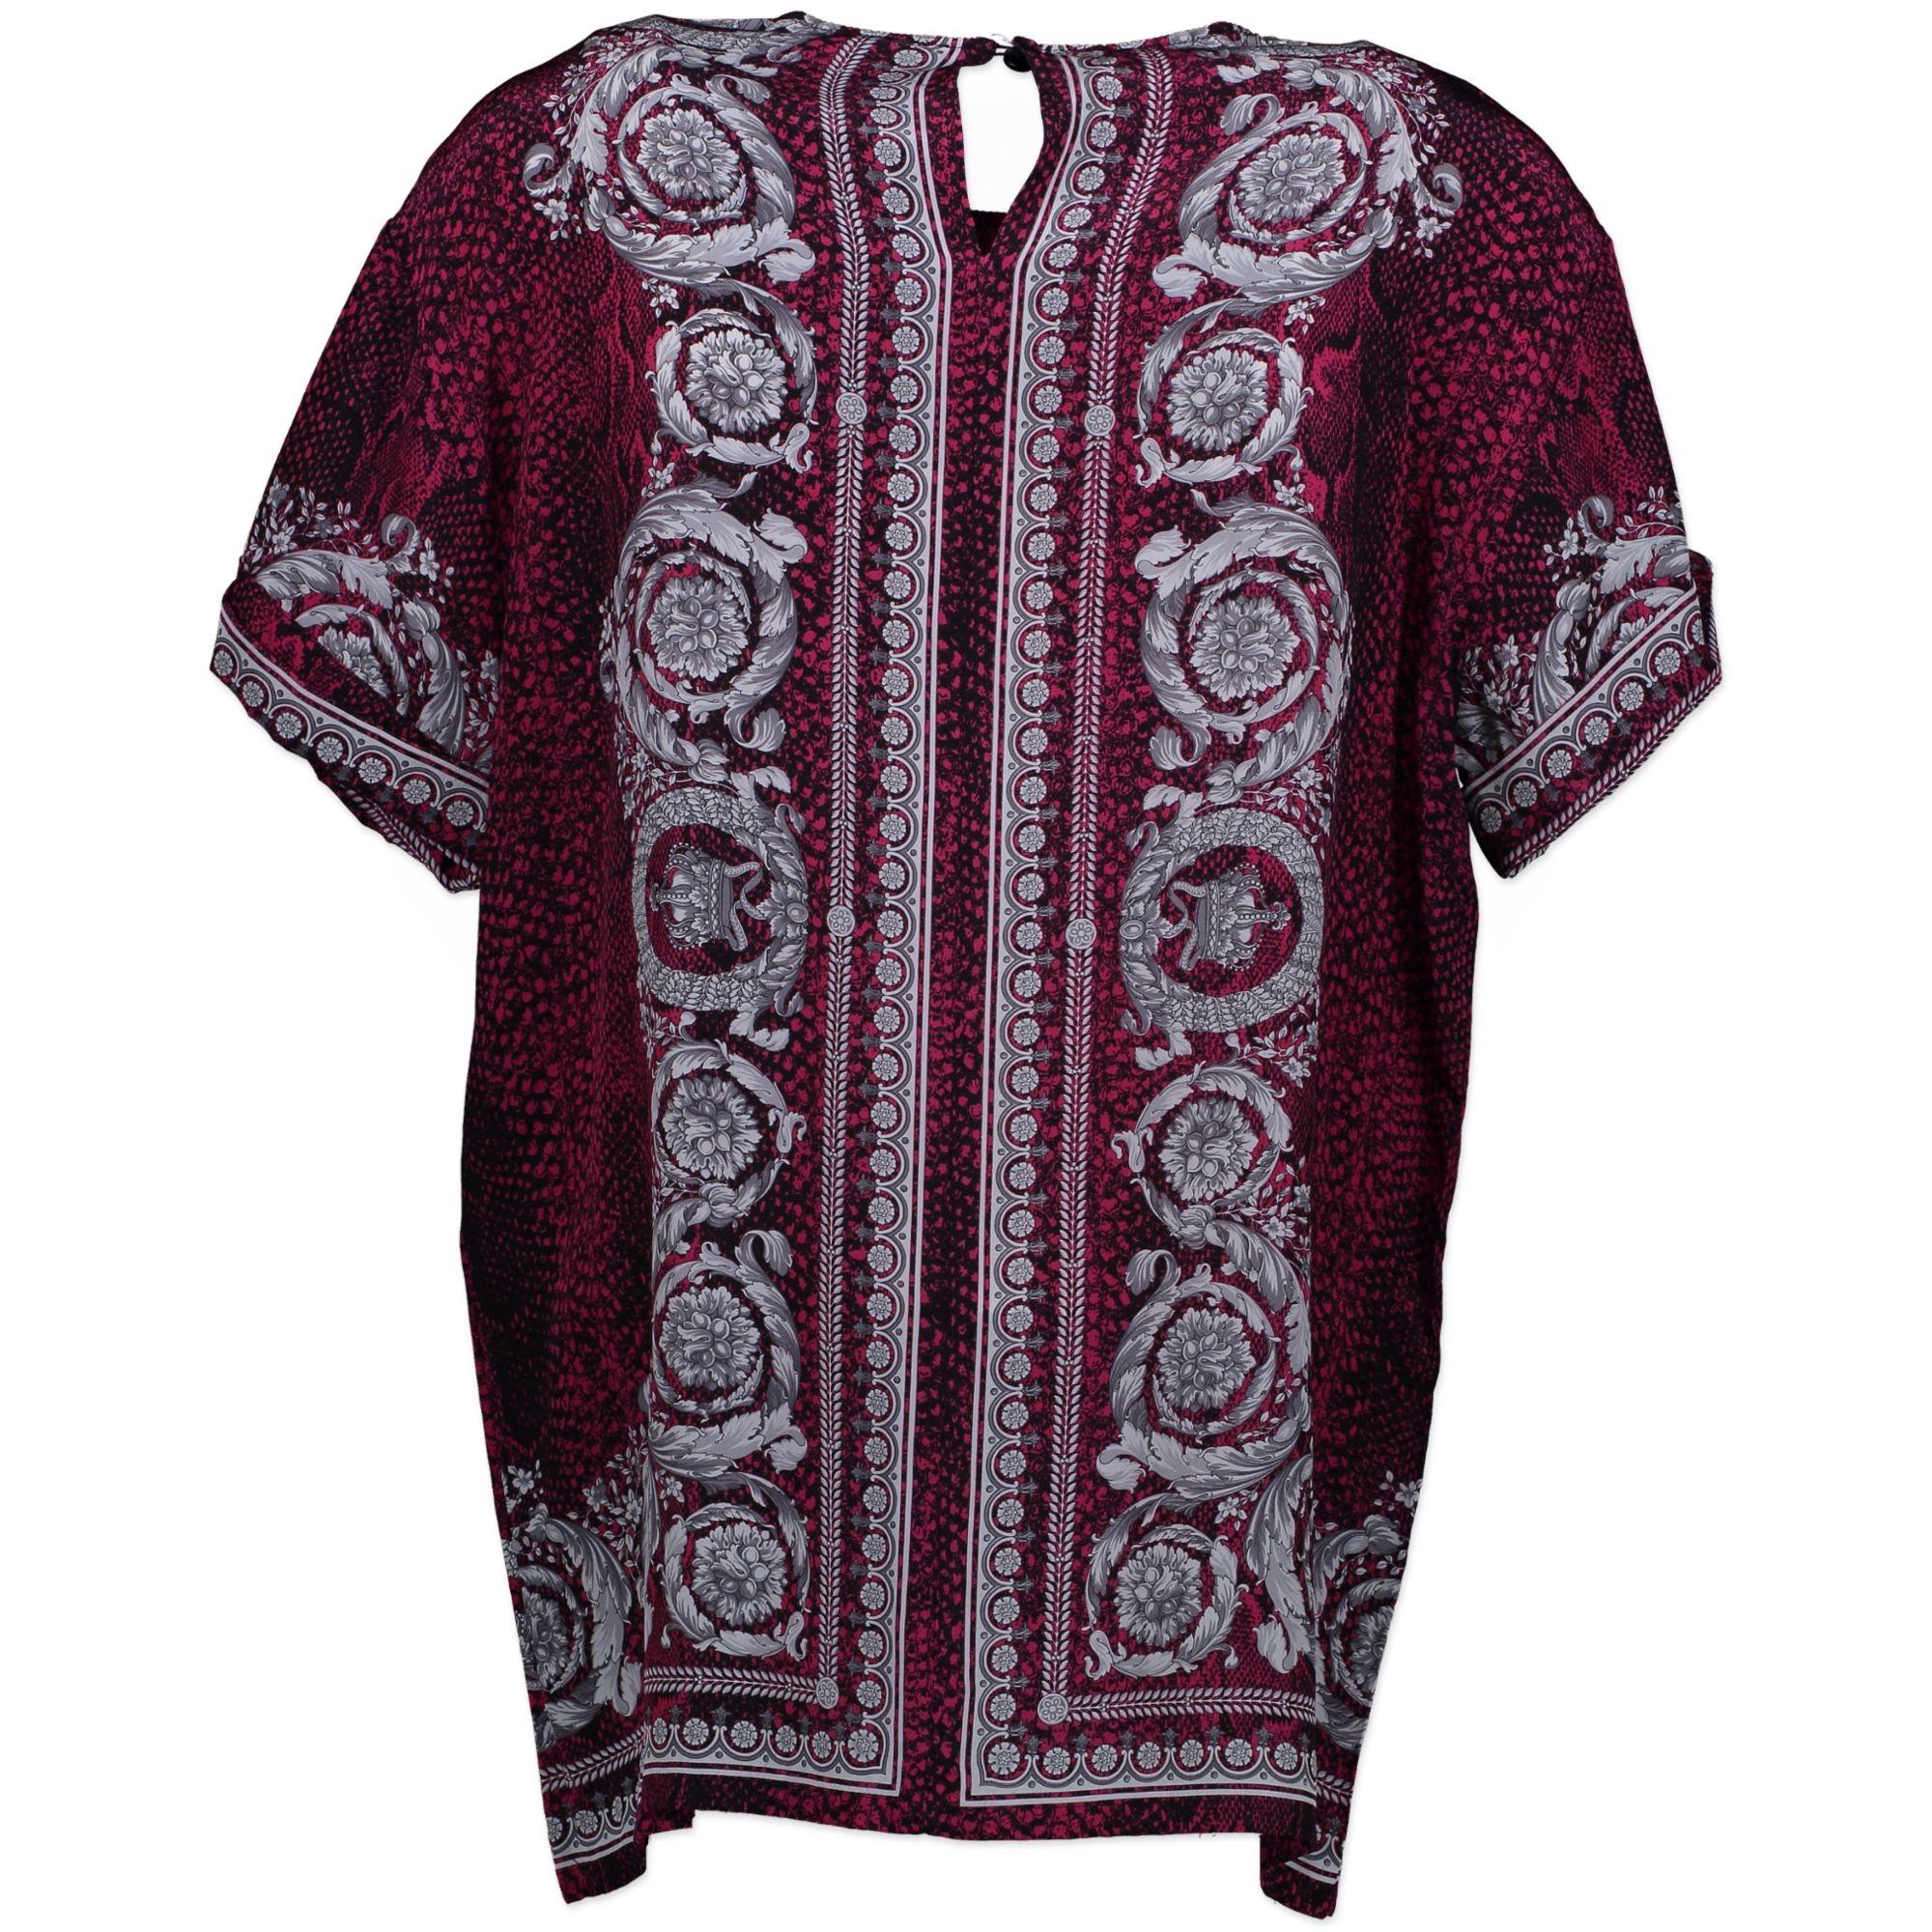 Versace Snake Print Shirt - size S/M